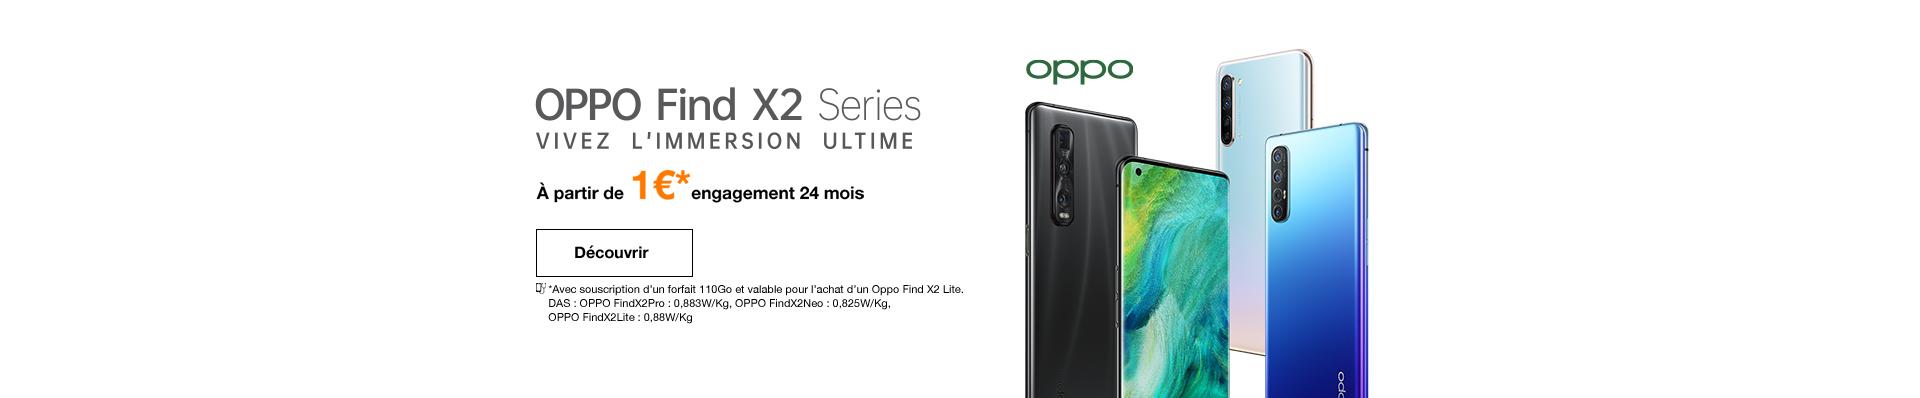 Oppo X2 series